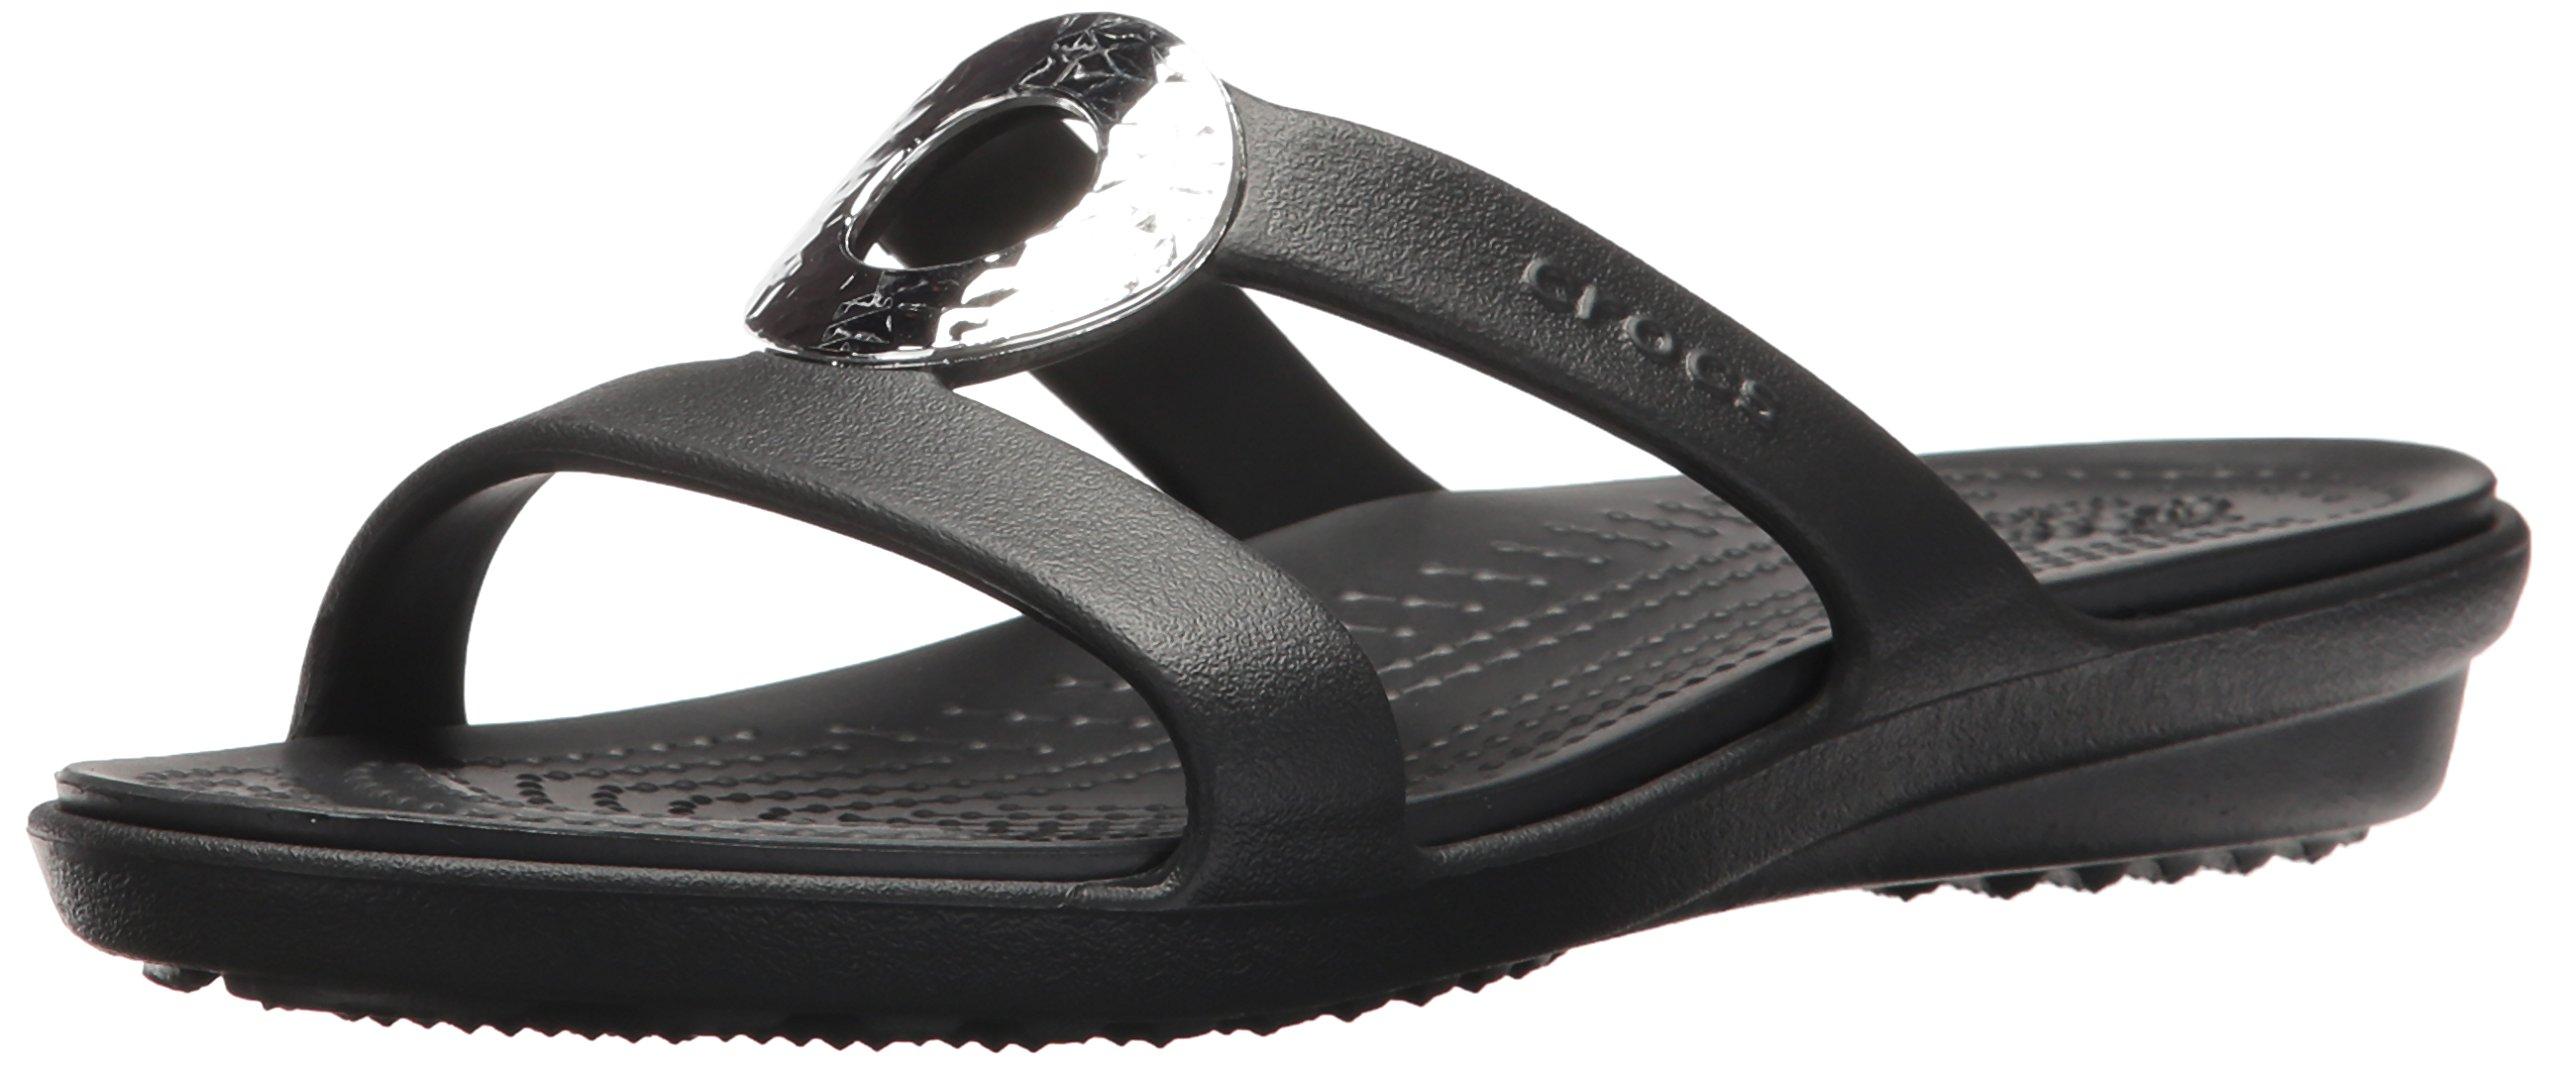 Crocs Women's Sanrah Hammered Met W Flat Sandal, Black/Black, 8 M US